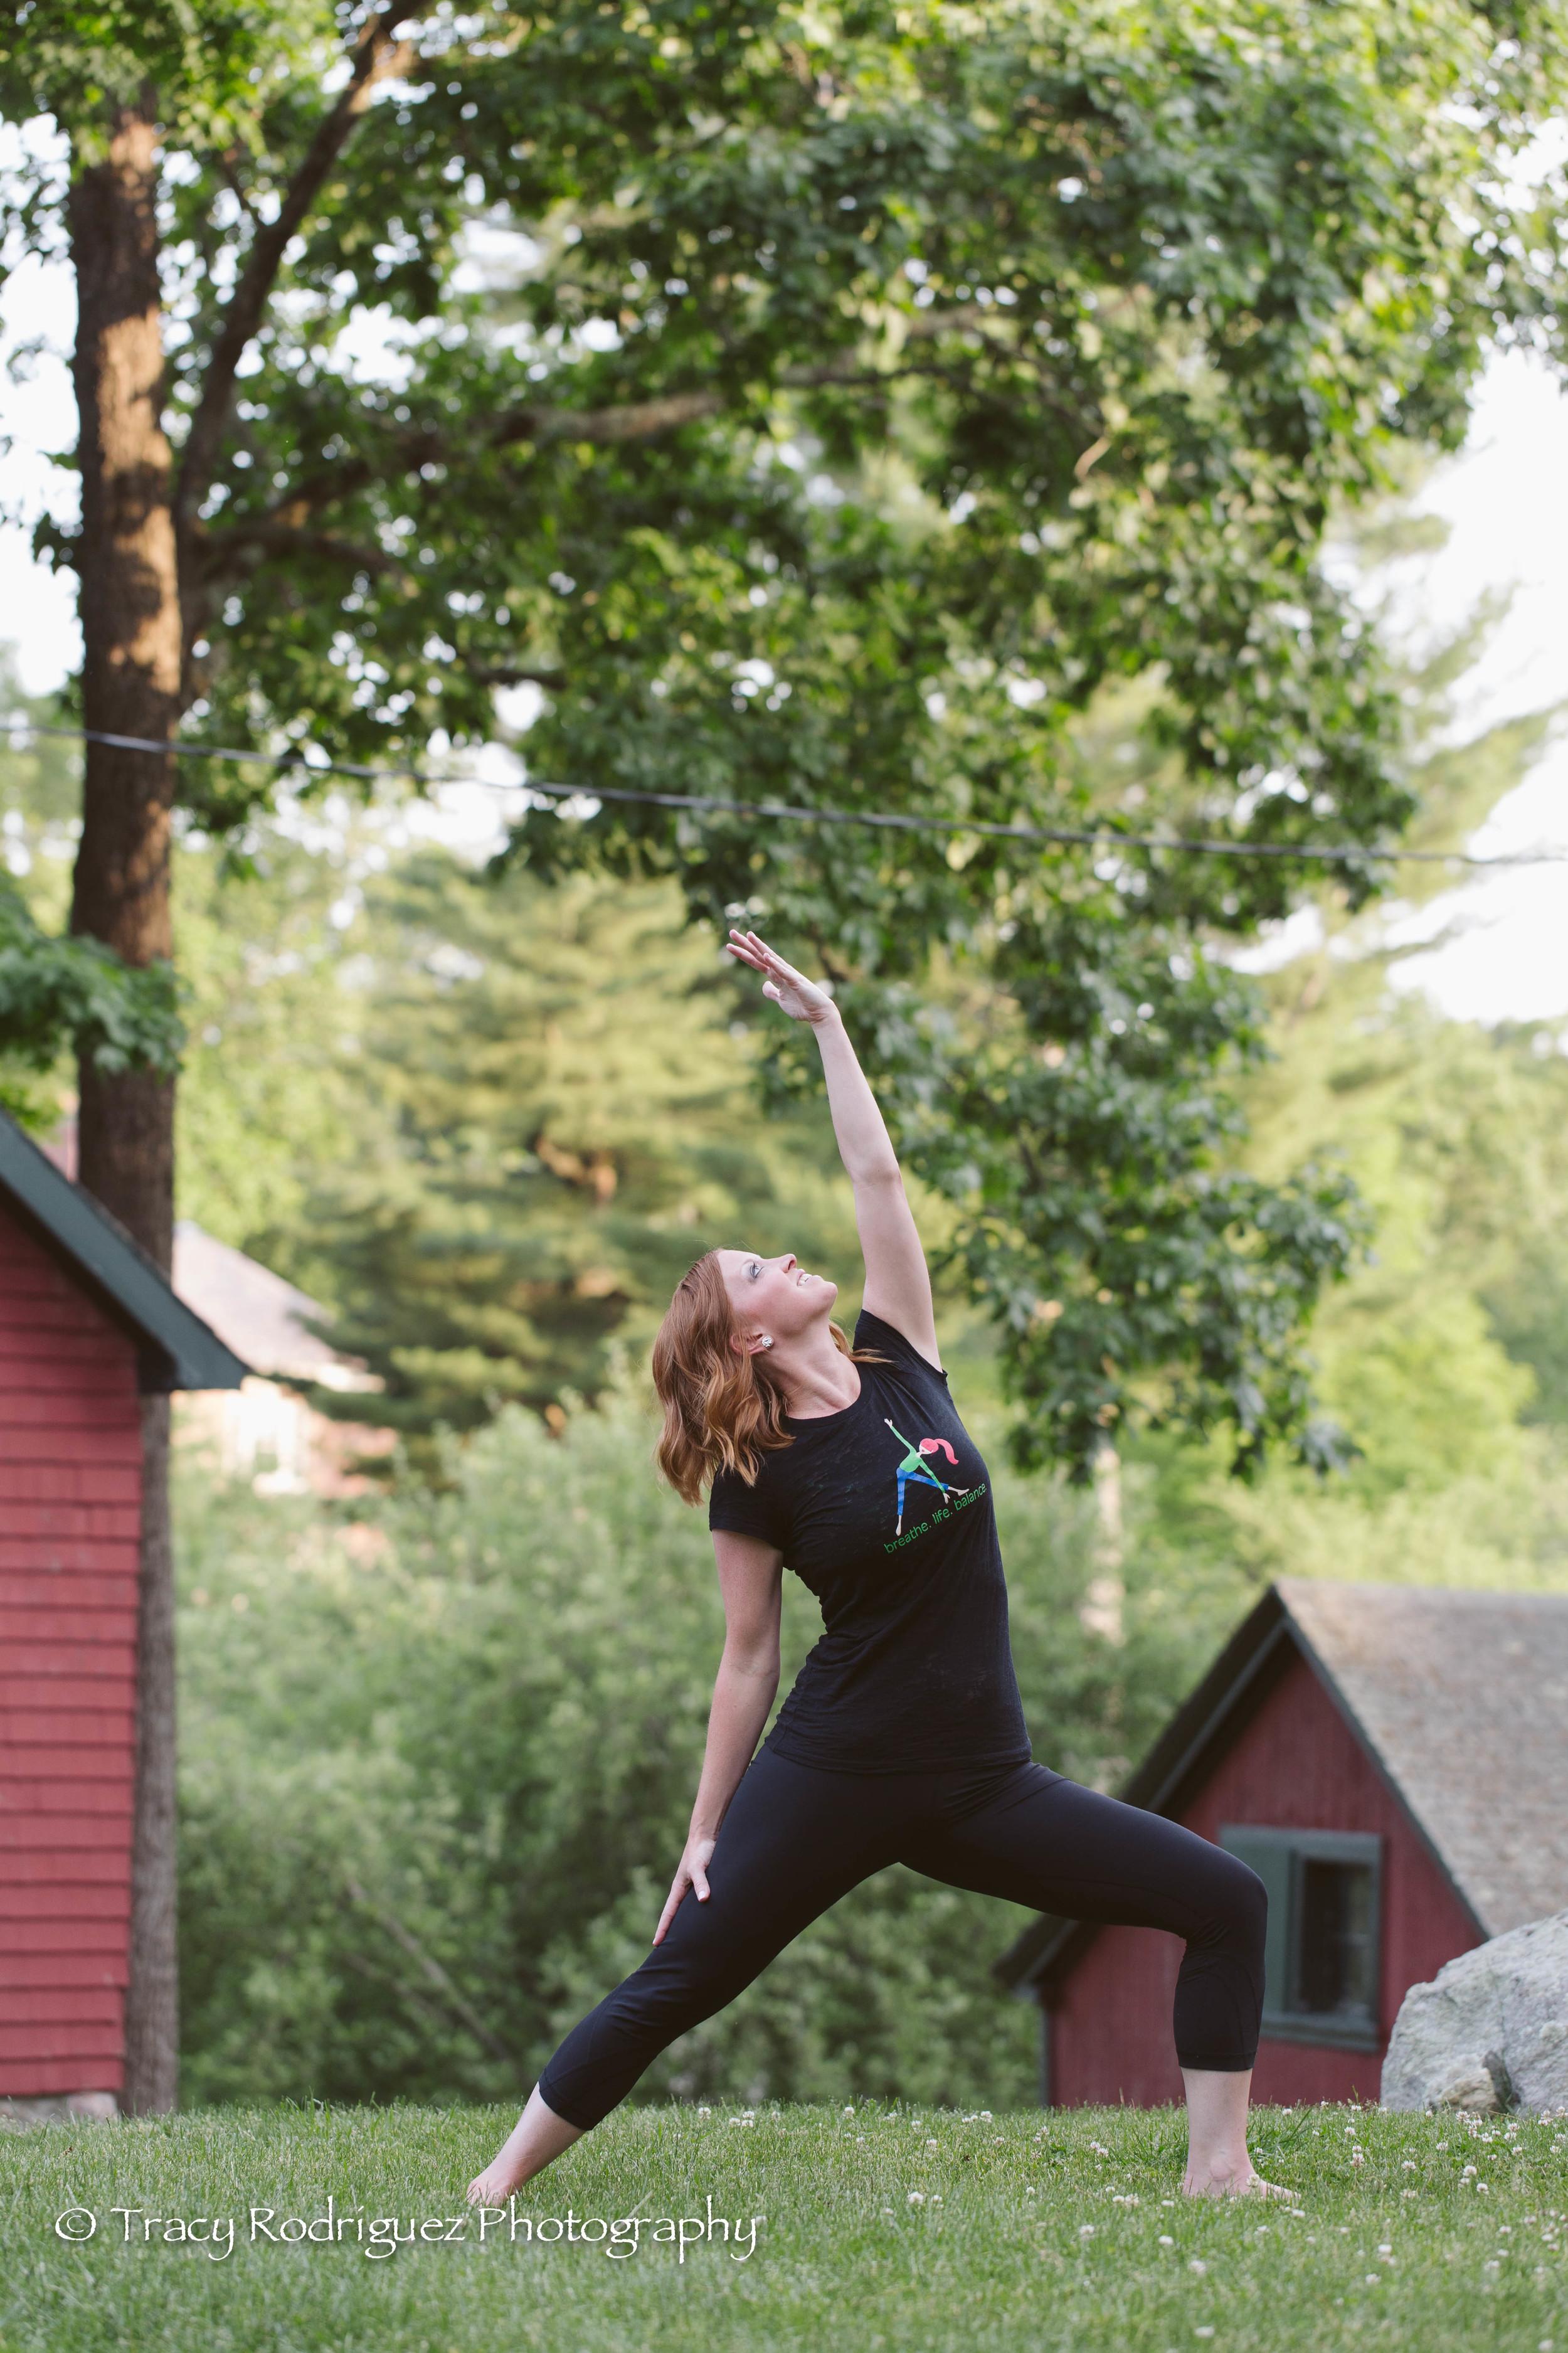 TracyRodriguezPhotography-Kelly-18.jpg